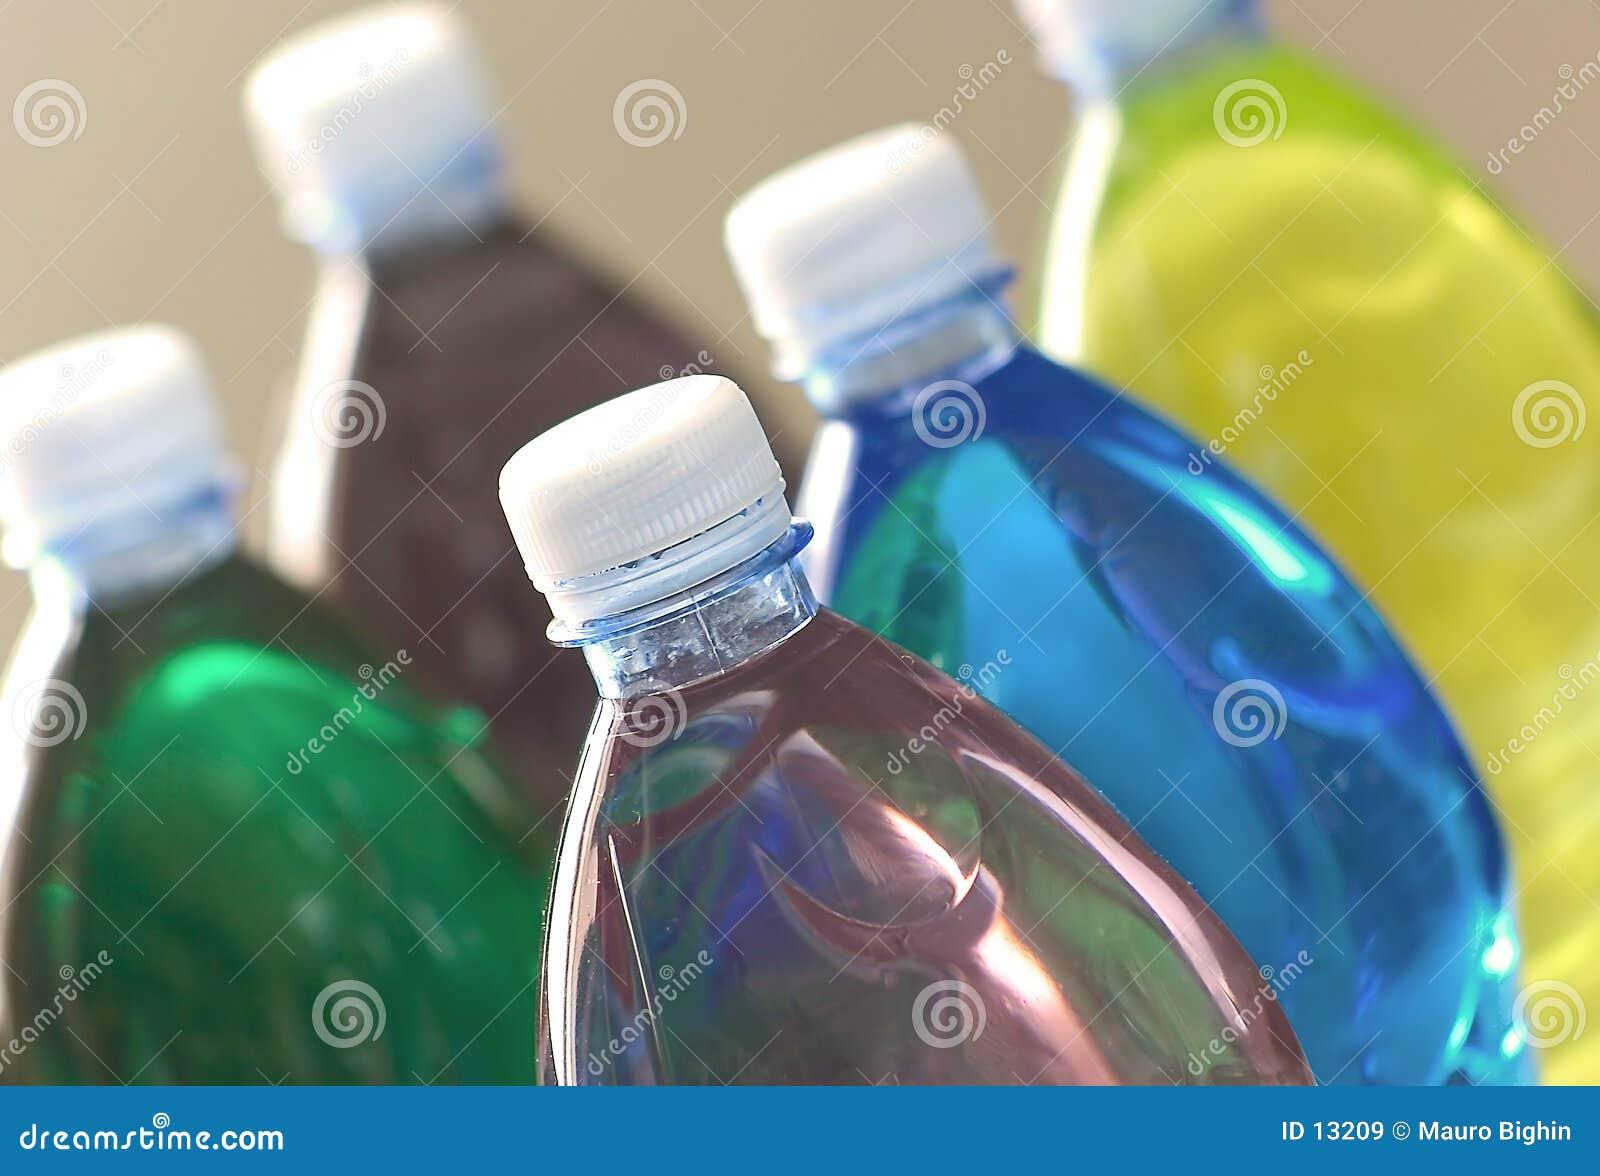 Colored drinks - plastic bottles